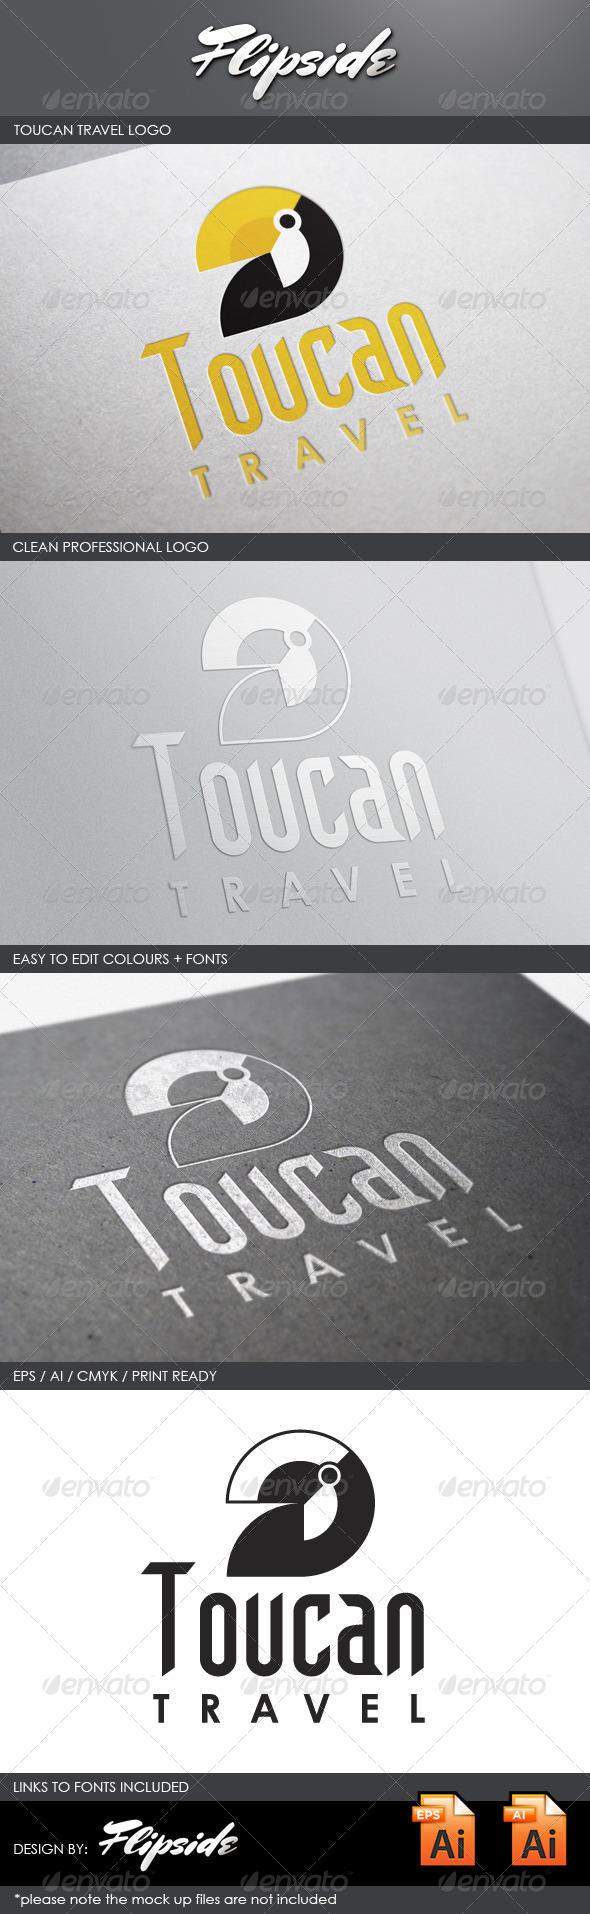 GraphicRiver Toucan Travel Logo 4328030